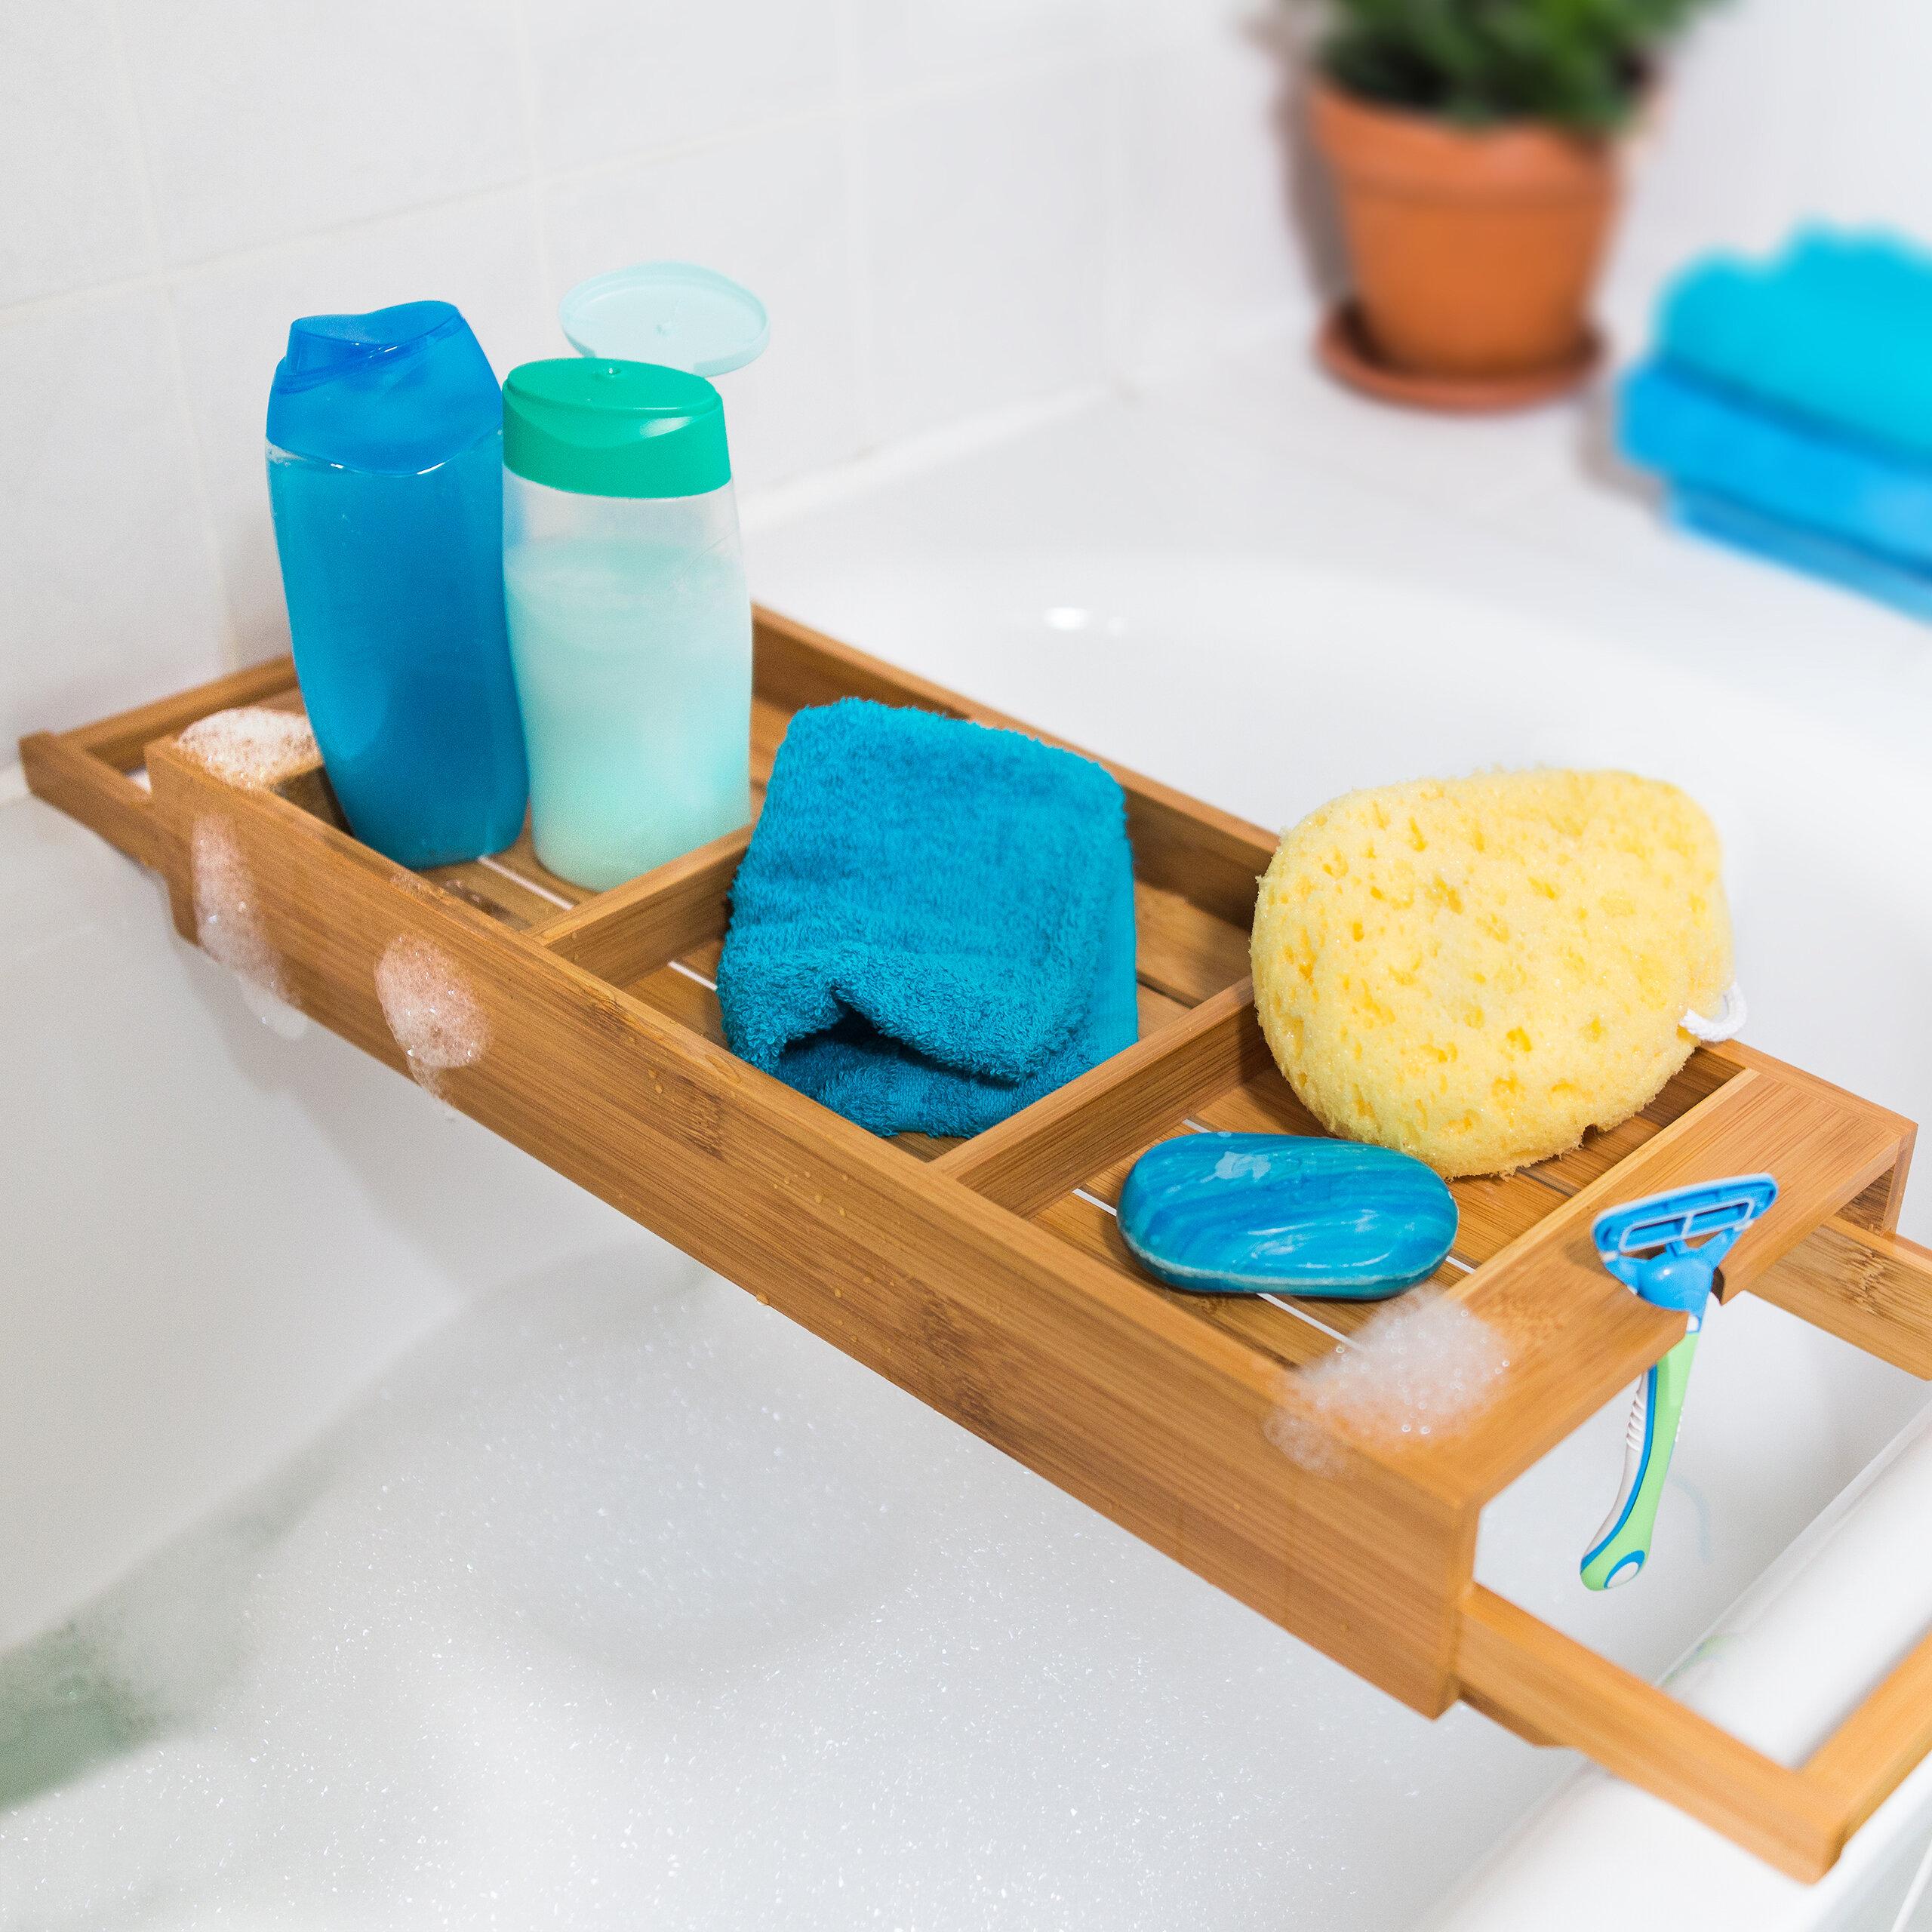 Relaxdays Bamboo Bathroom Caddy Tub Tray & Reviews   Wayfair.co.uk